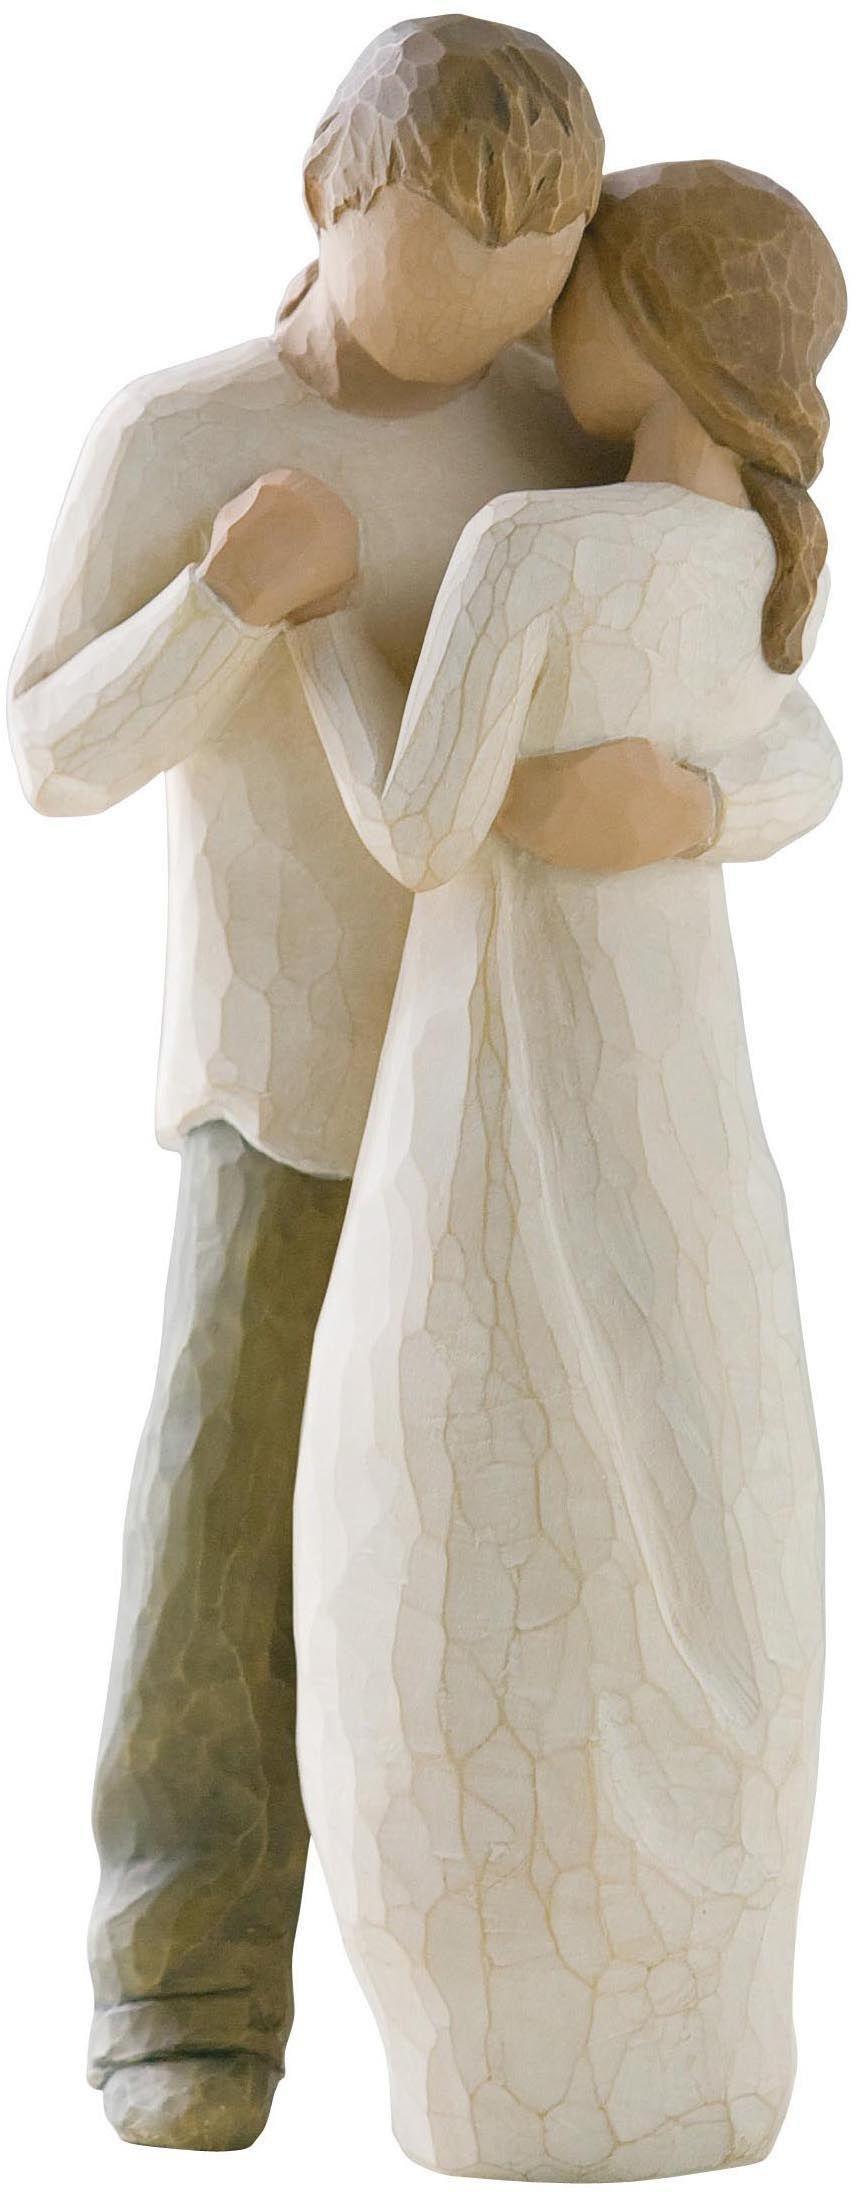 Willow Tree - Promise - Figurine lowest price